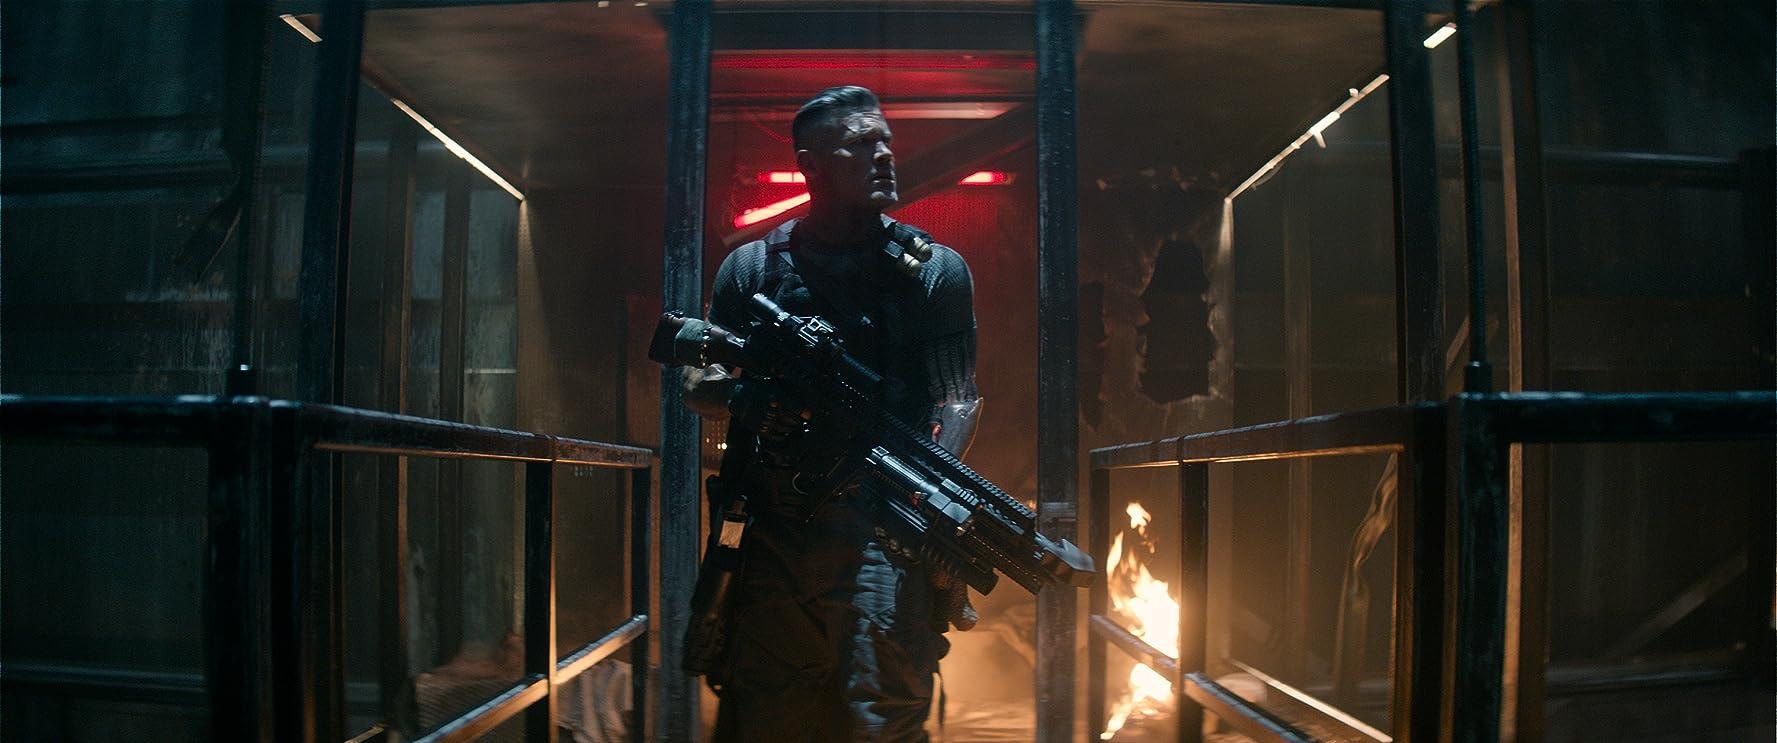 Josh Brolin in Deadpool 2 (2018)